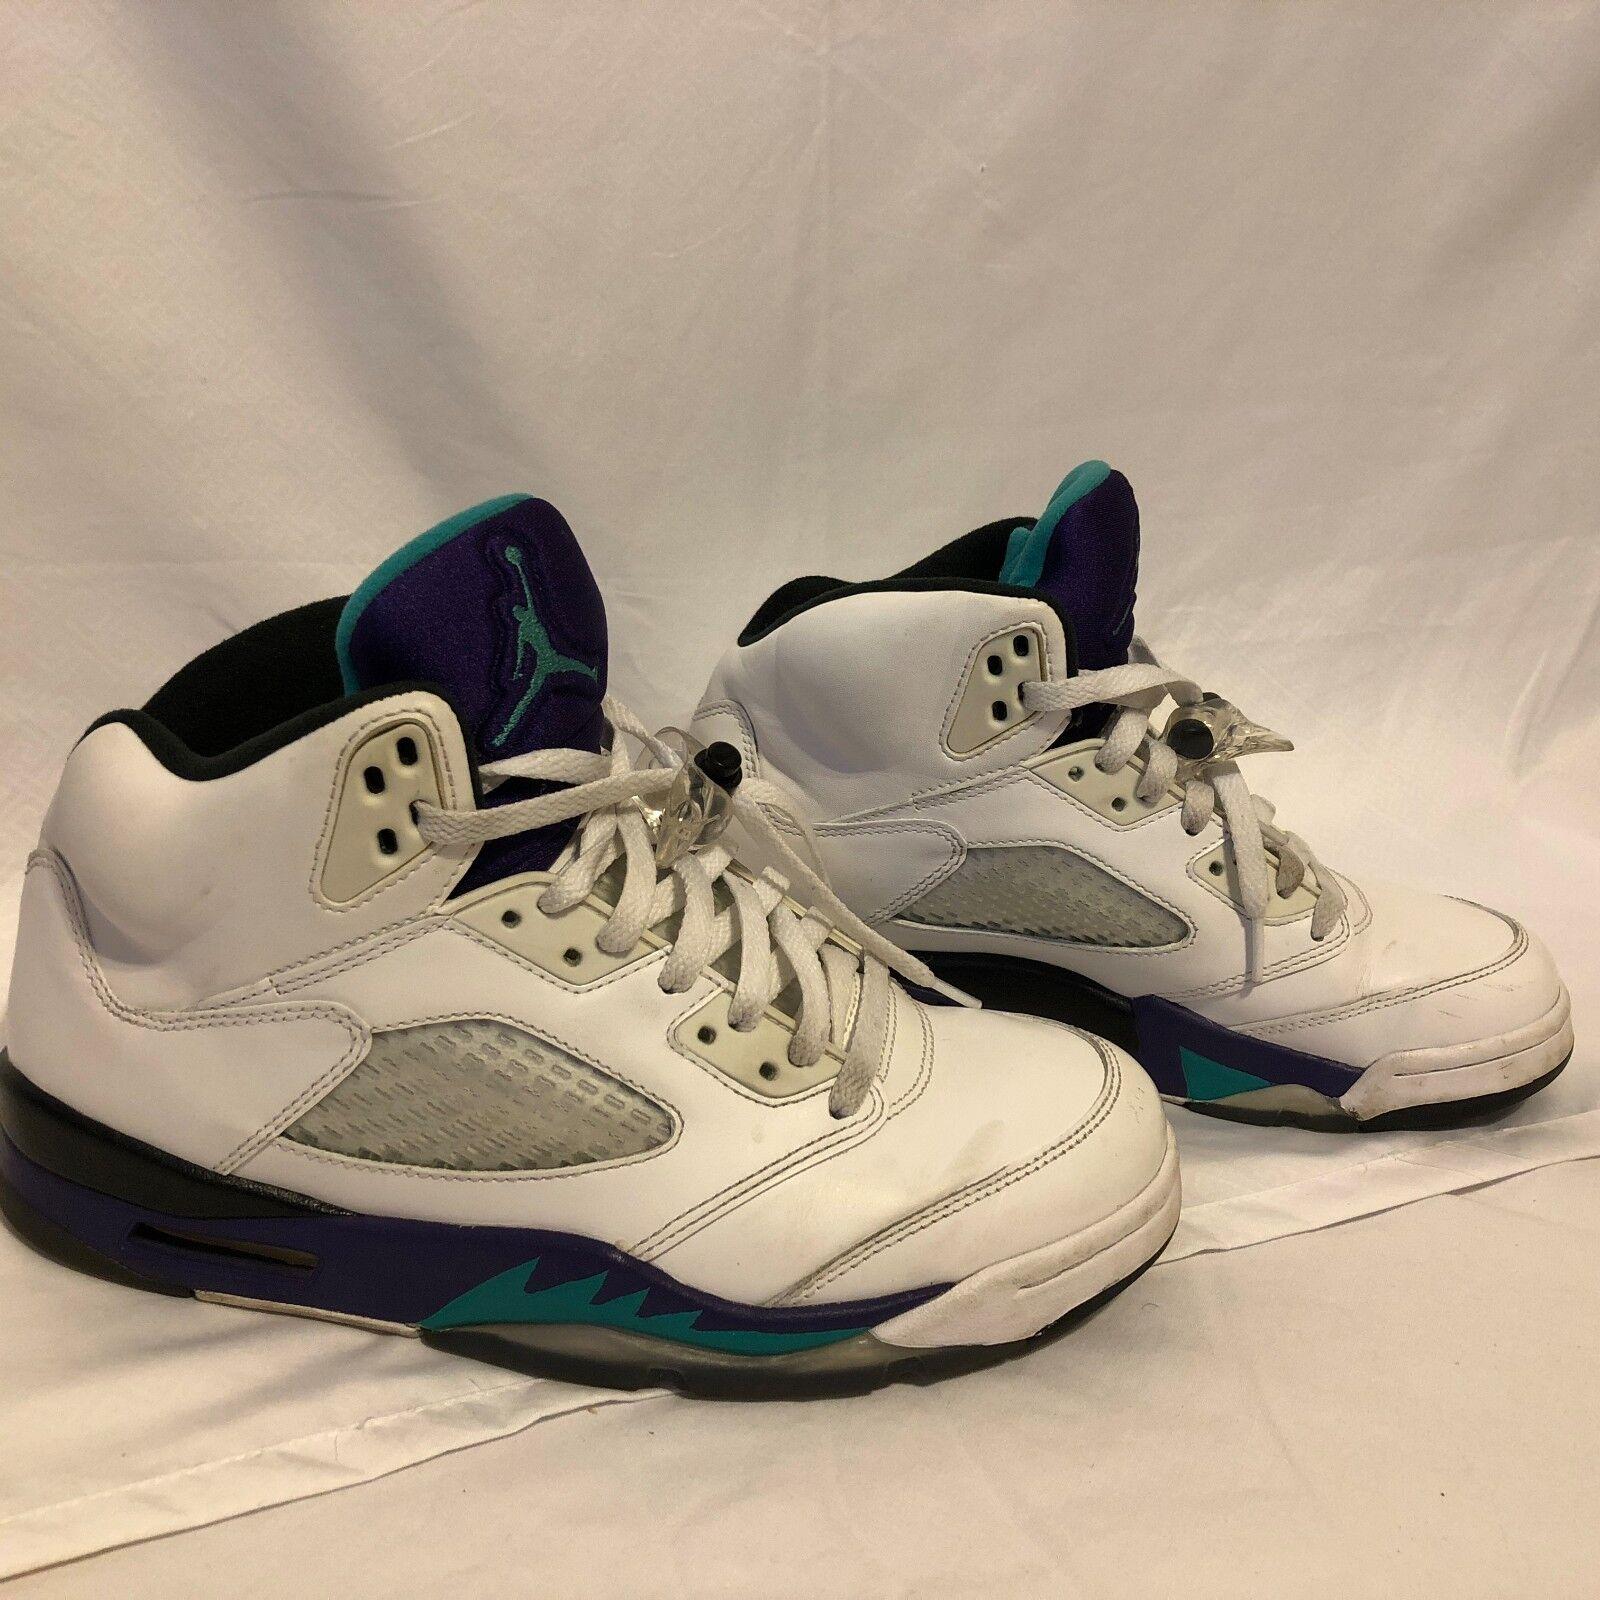 huge discount 4cd85 94c64 Nike Nike Nike Air Jordan Retro 5 White Grape 136027-108 Men s Size 8.5  373c7f